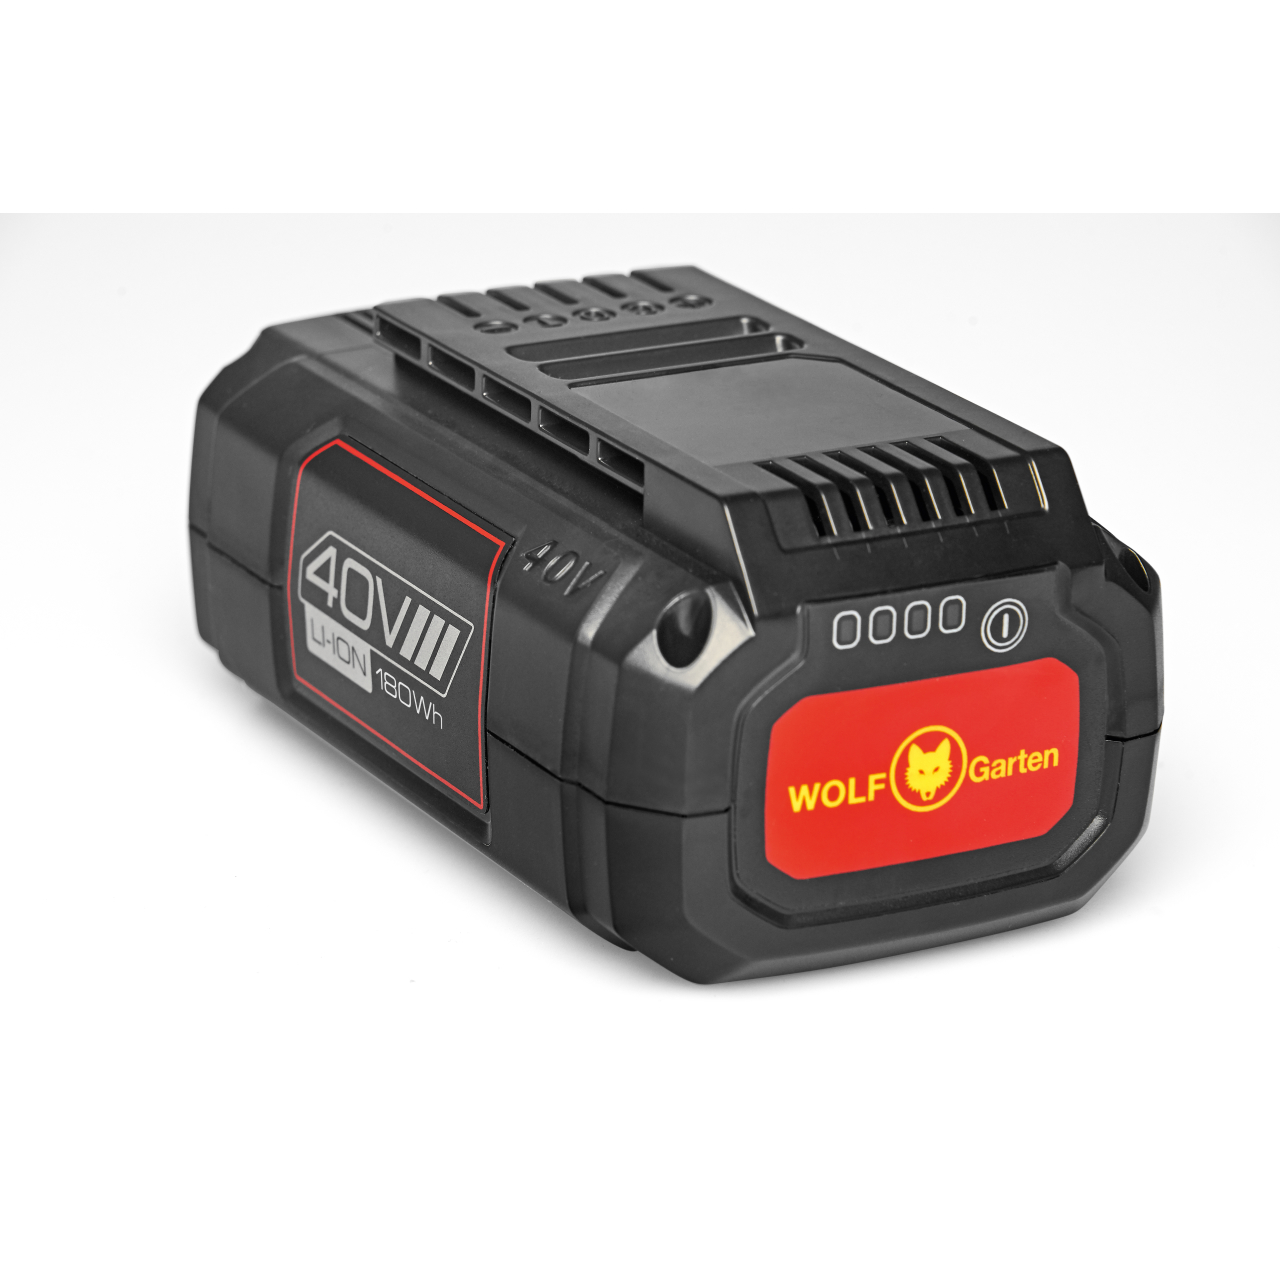 Akku LYCOS 40/500 A 40 V / 5,0 Ah 180 Wh